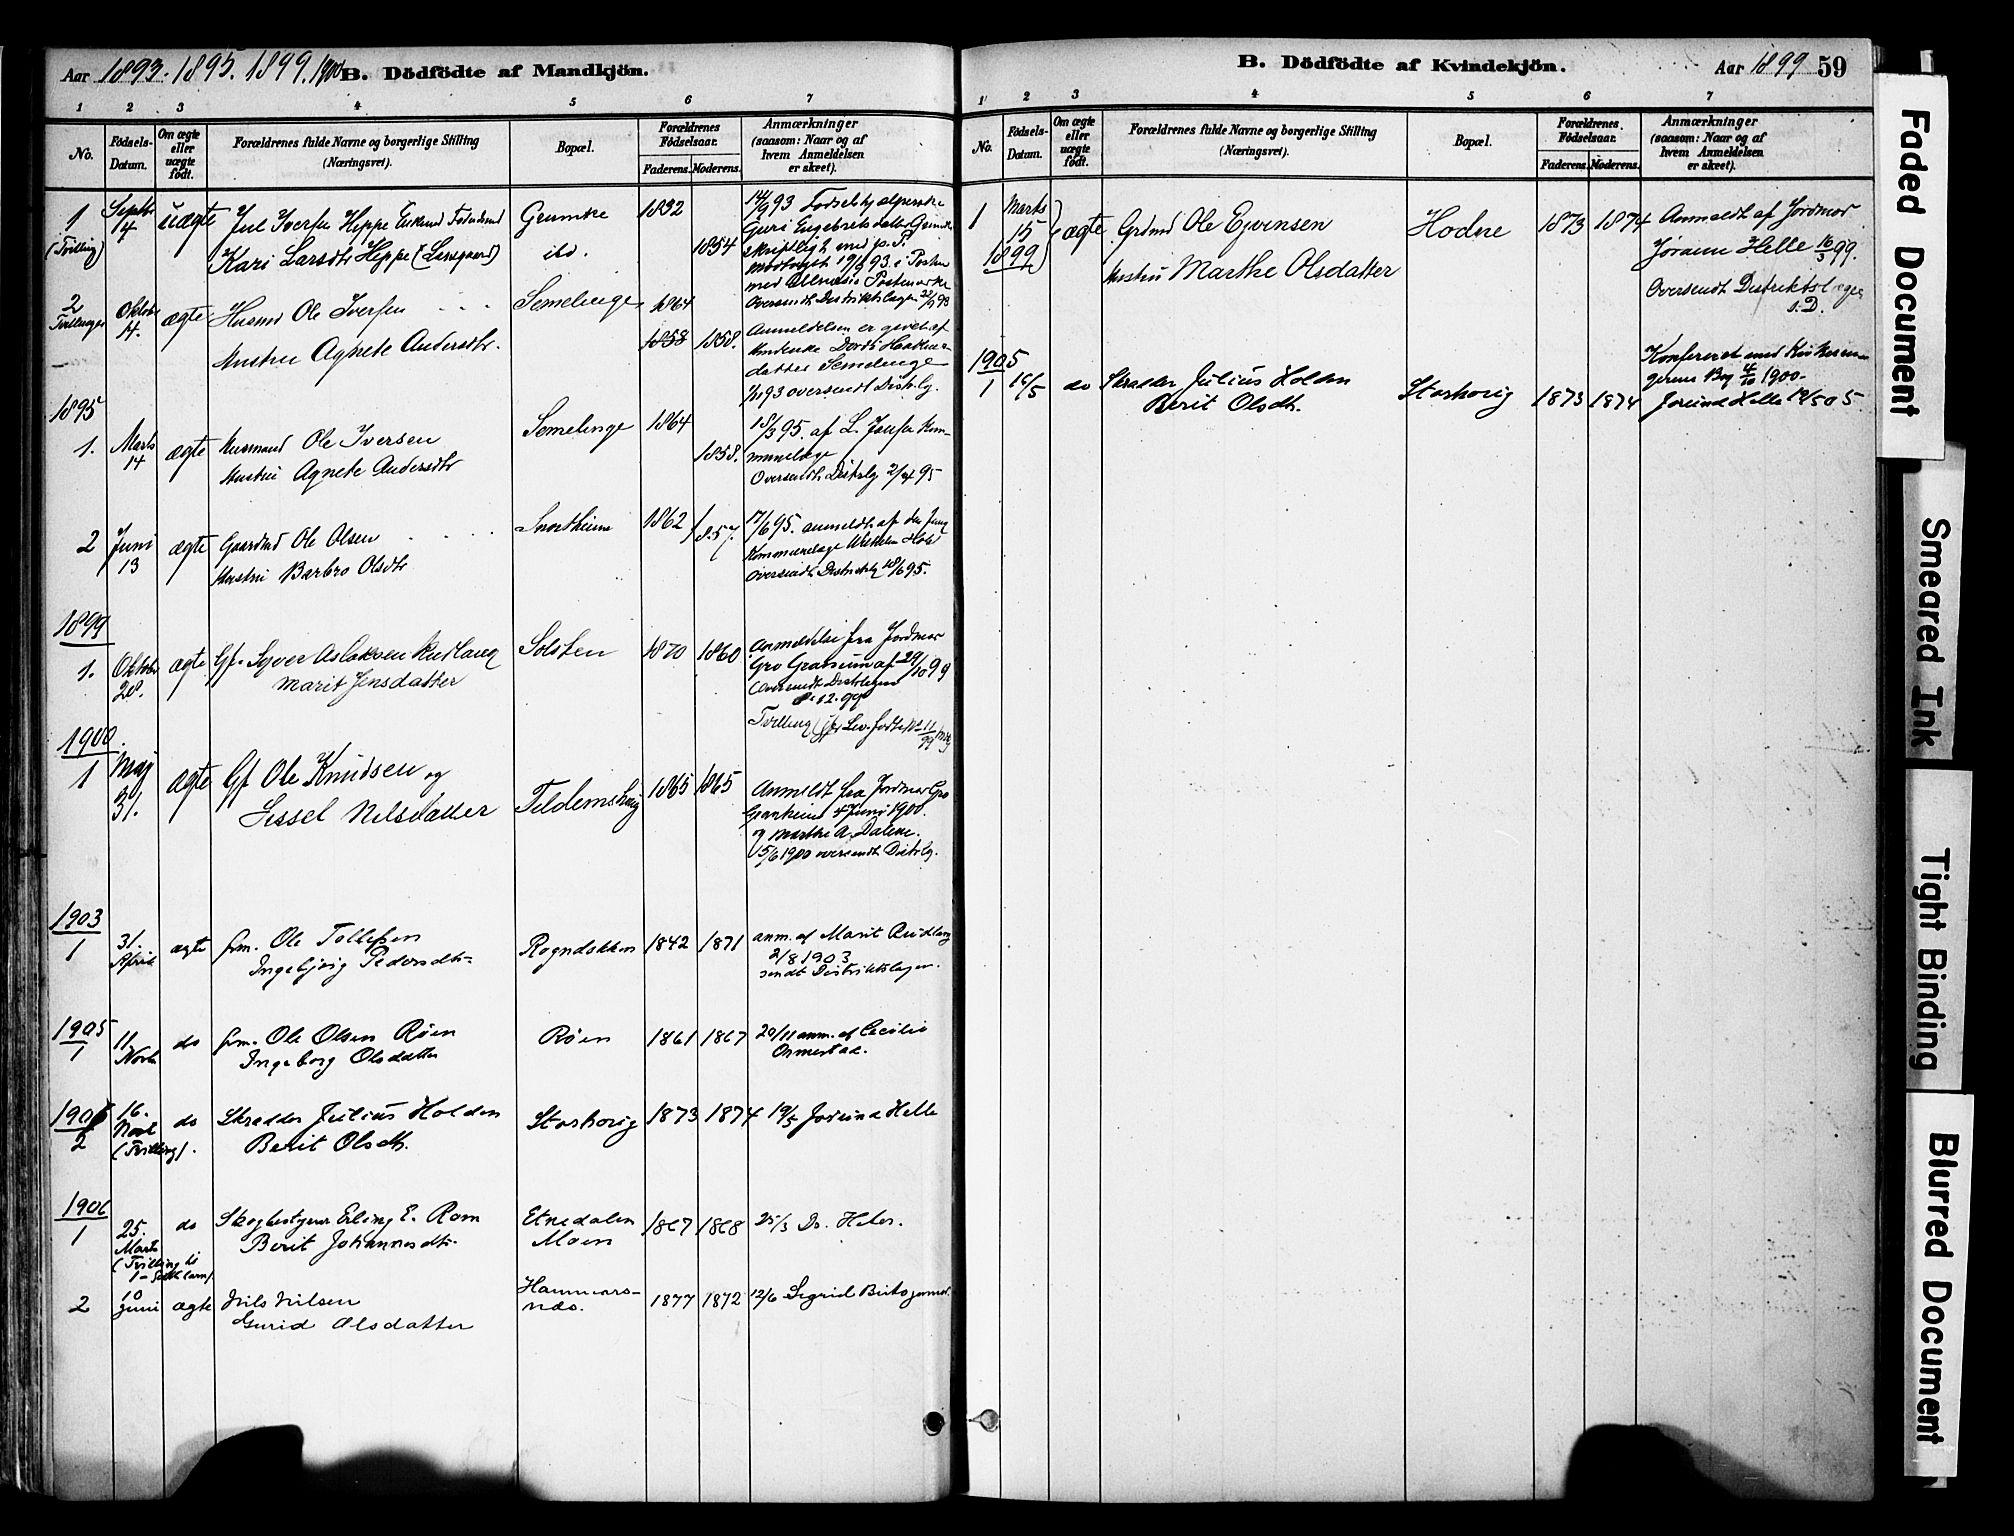 SAH, Vestre Slidre prestekontor, Ministerialbok nr. 6, 1881-1912, s. 59